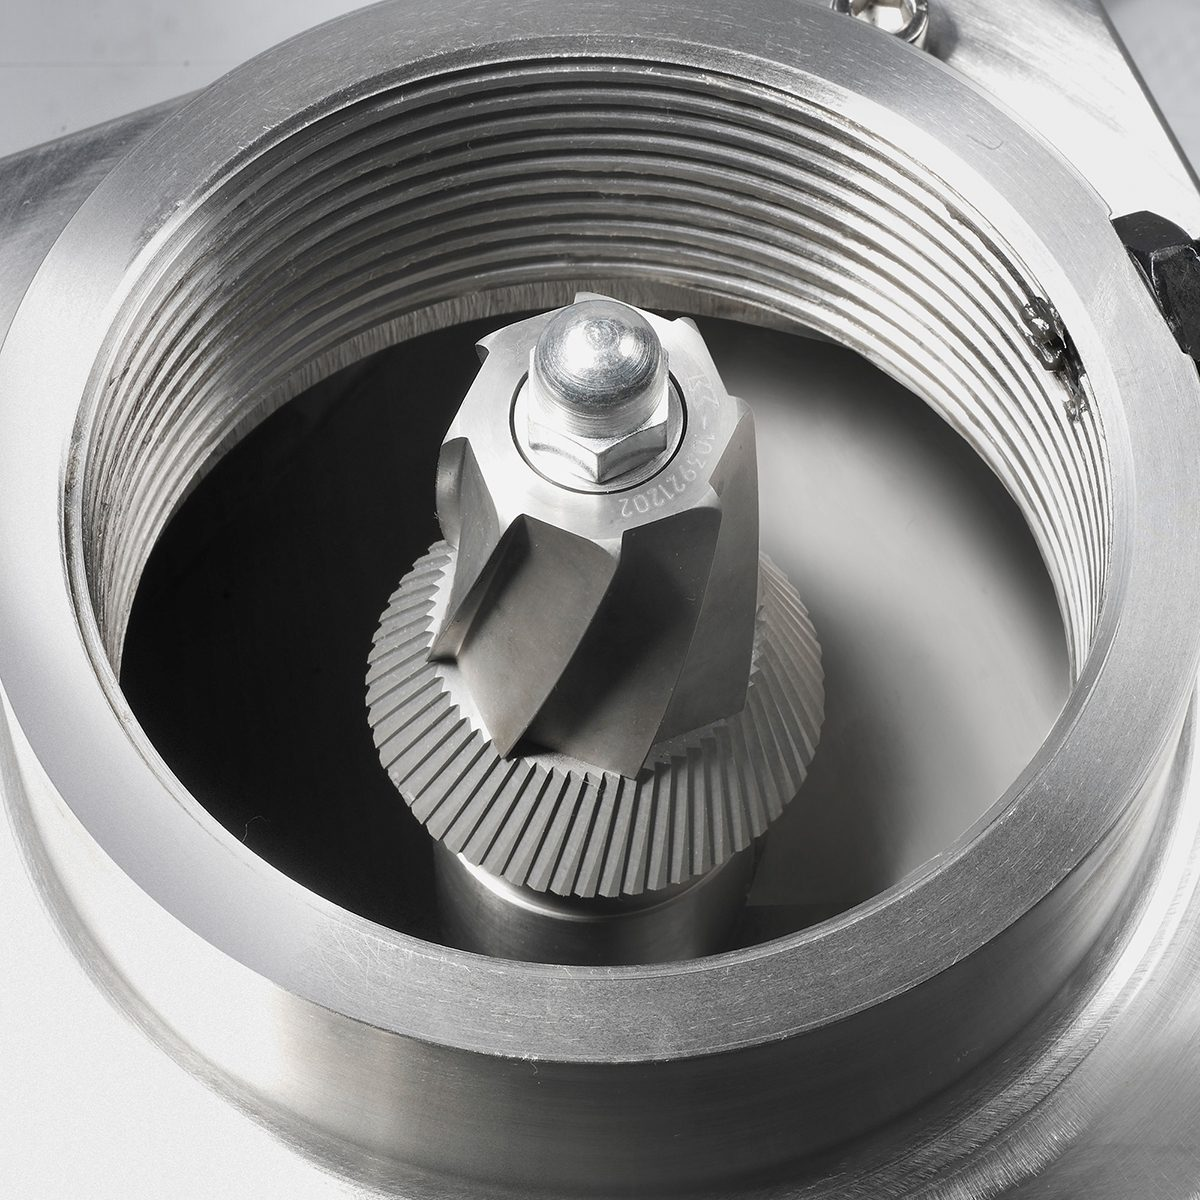 Kegelmühle KM 65 Mahlwerkzeug aus Wolframcarbid (WC)